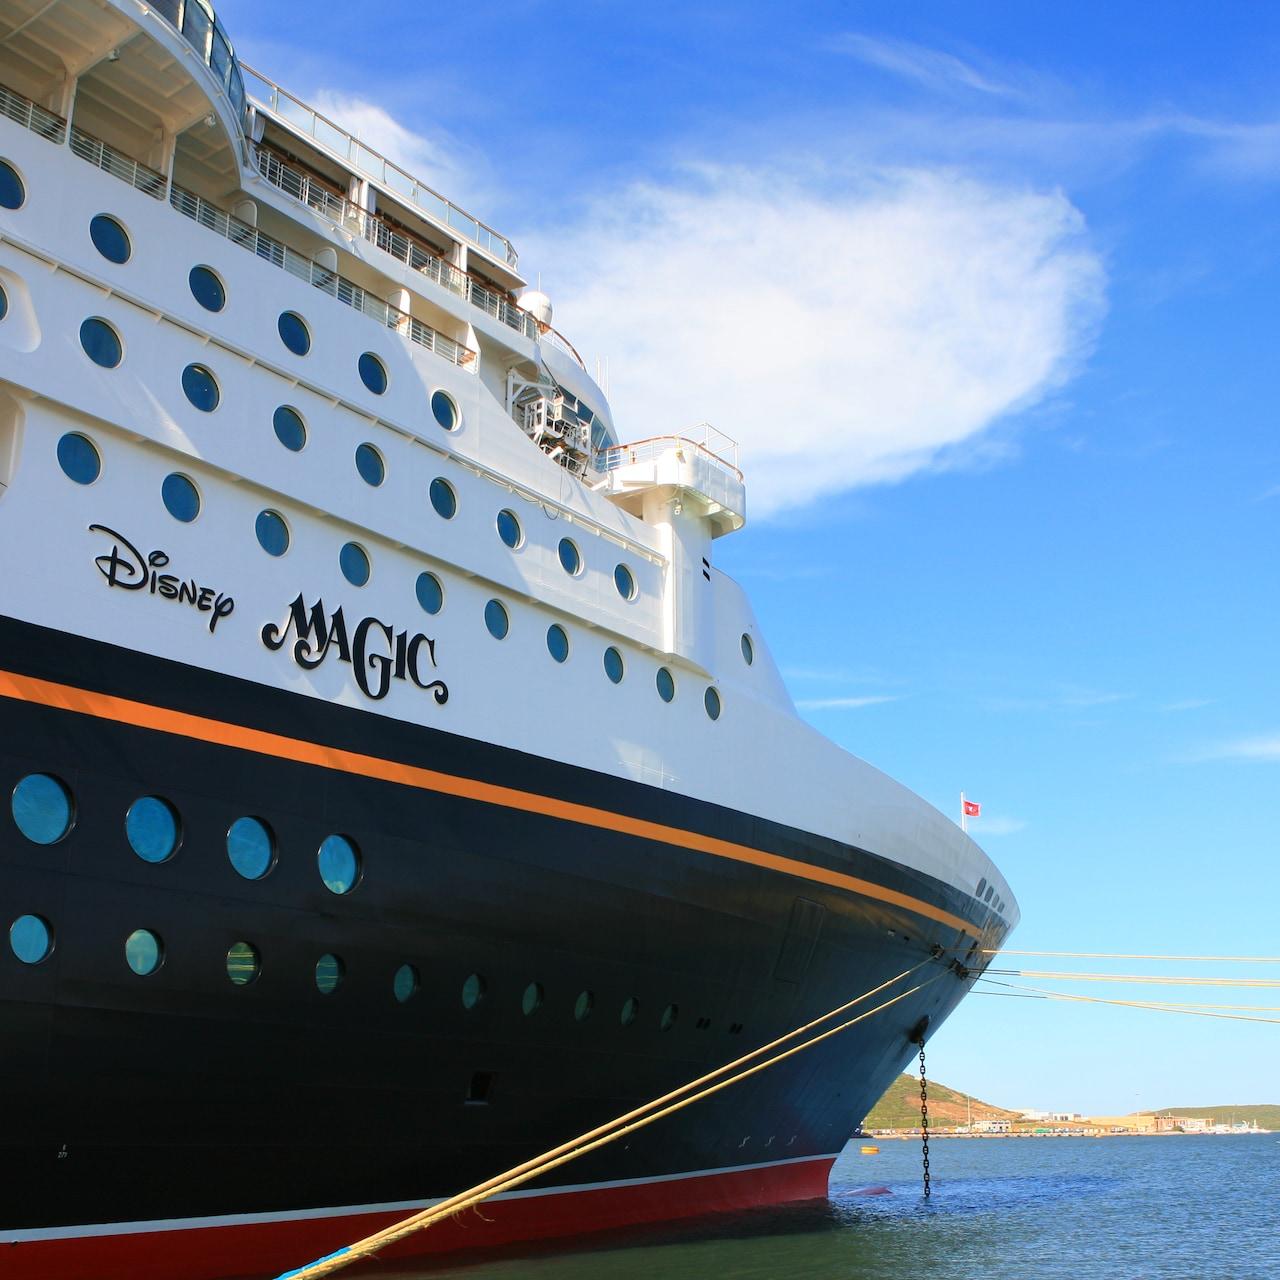 The Disney Magic cruise ship at anchor of a Mediterranean coastline